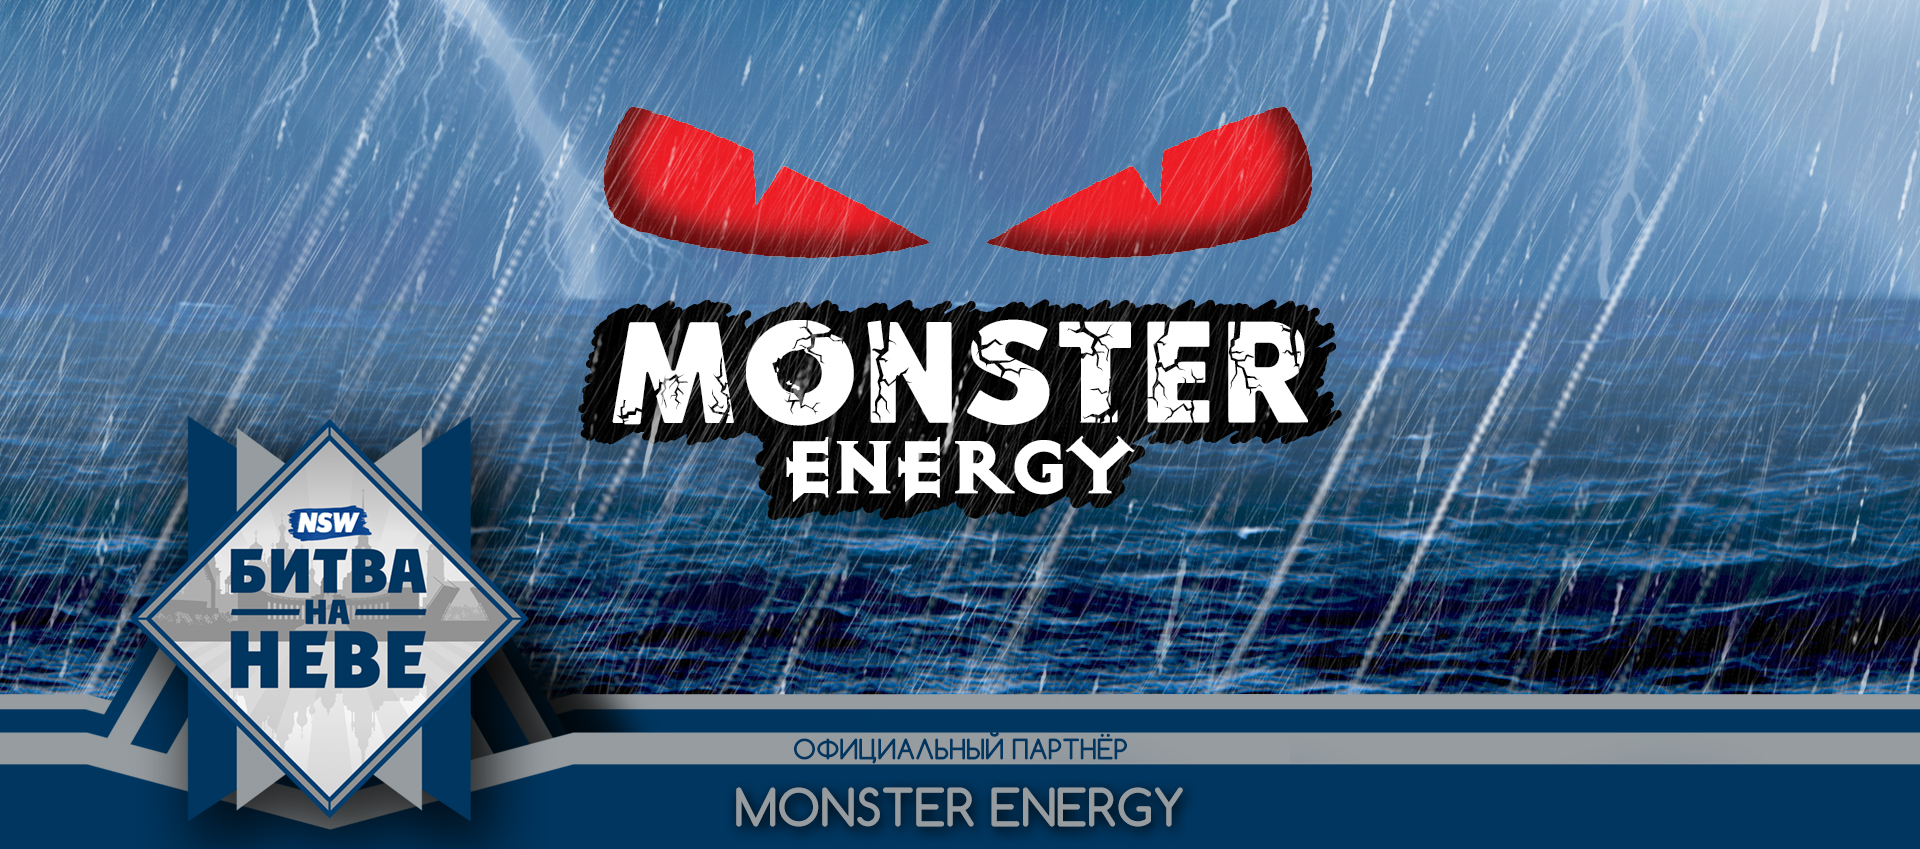 NSW Битва На Неве: Партнёр - Энергетический напиток MONSTER Energy